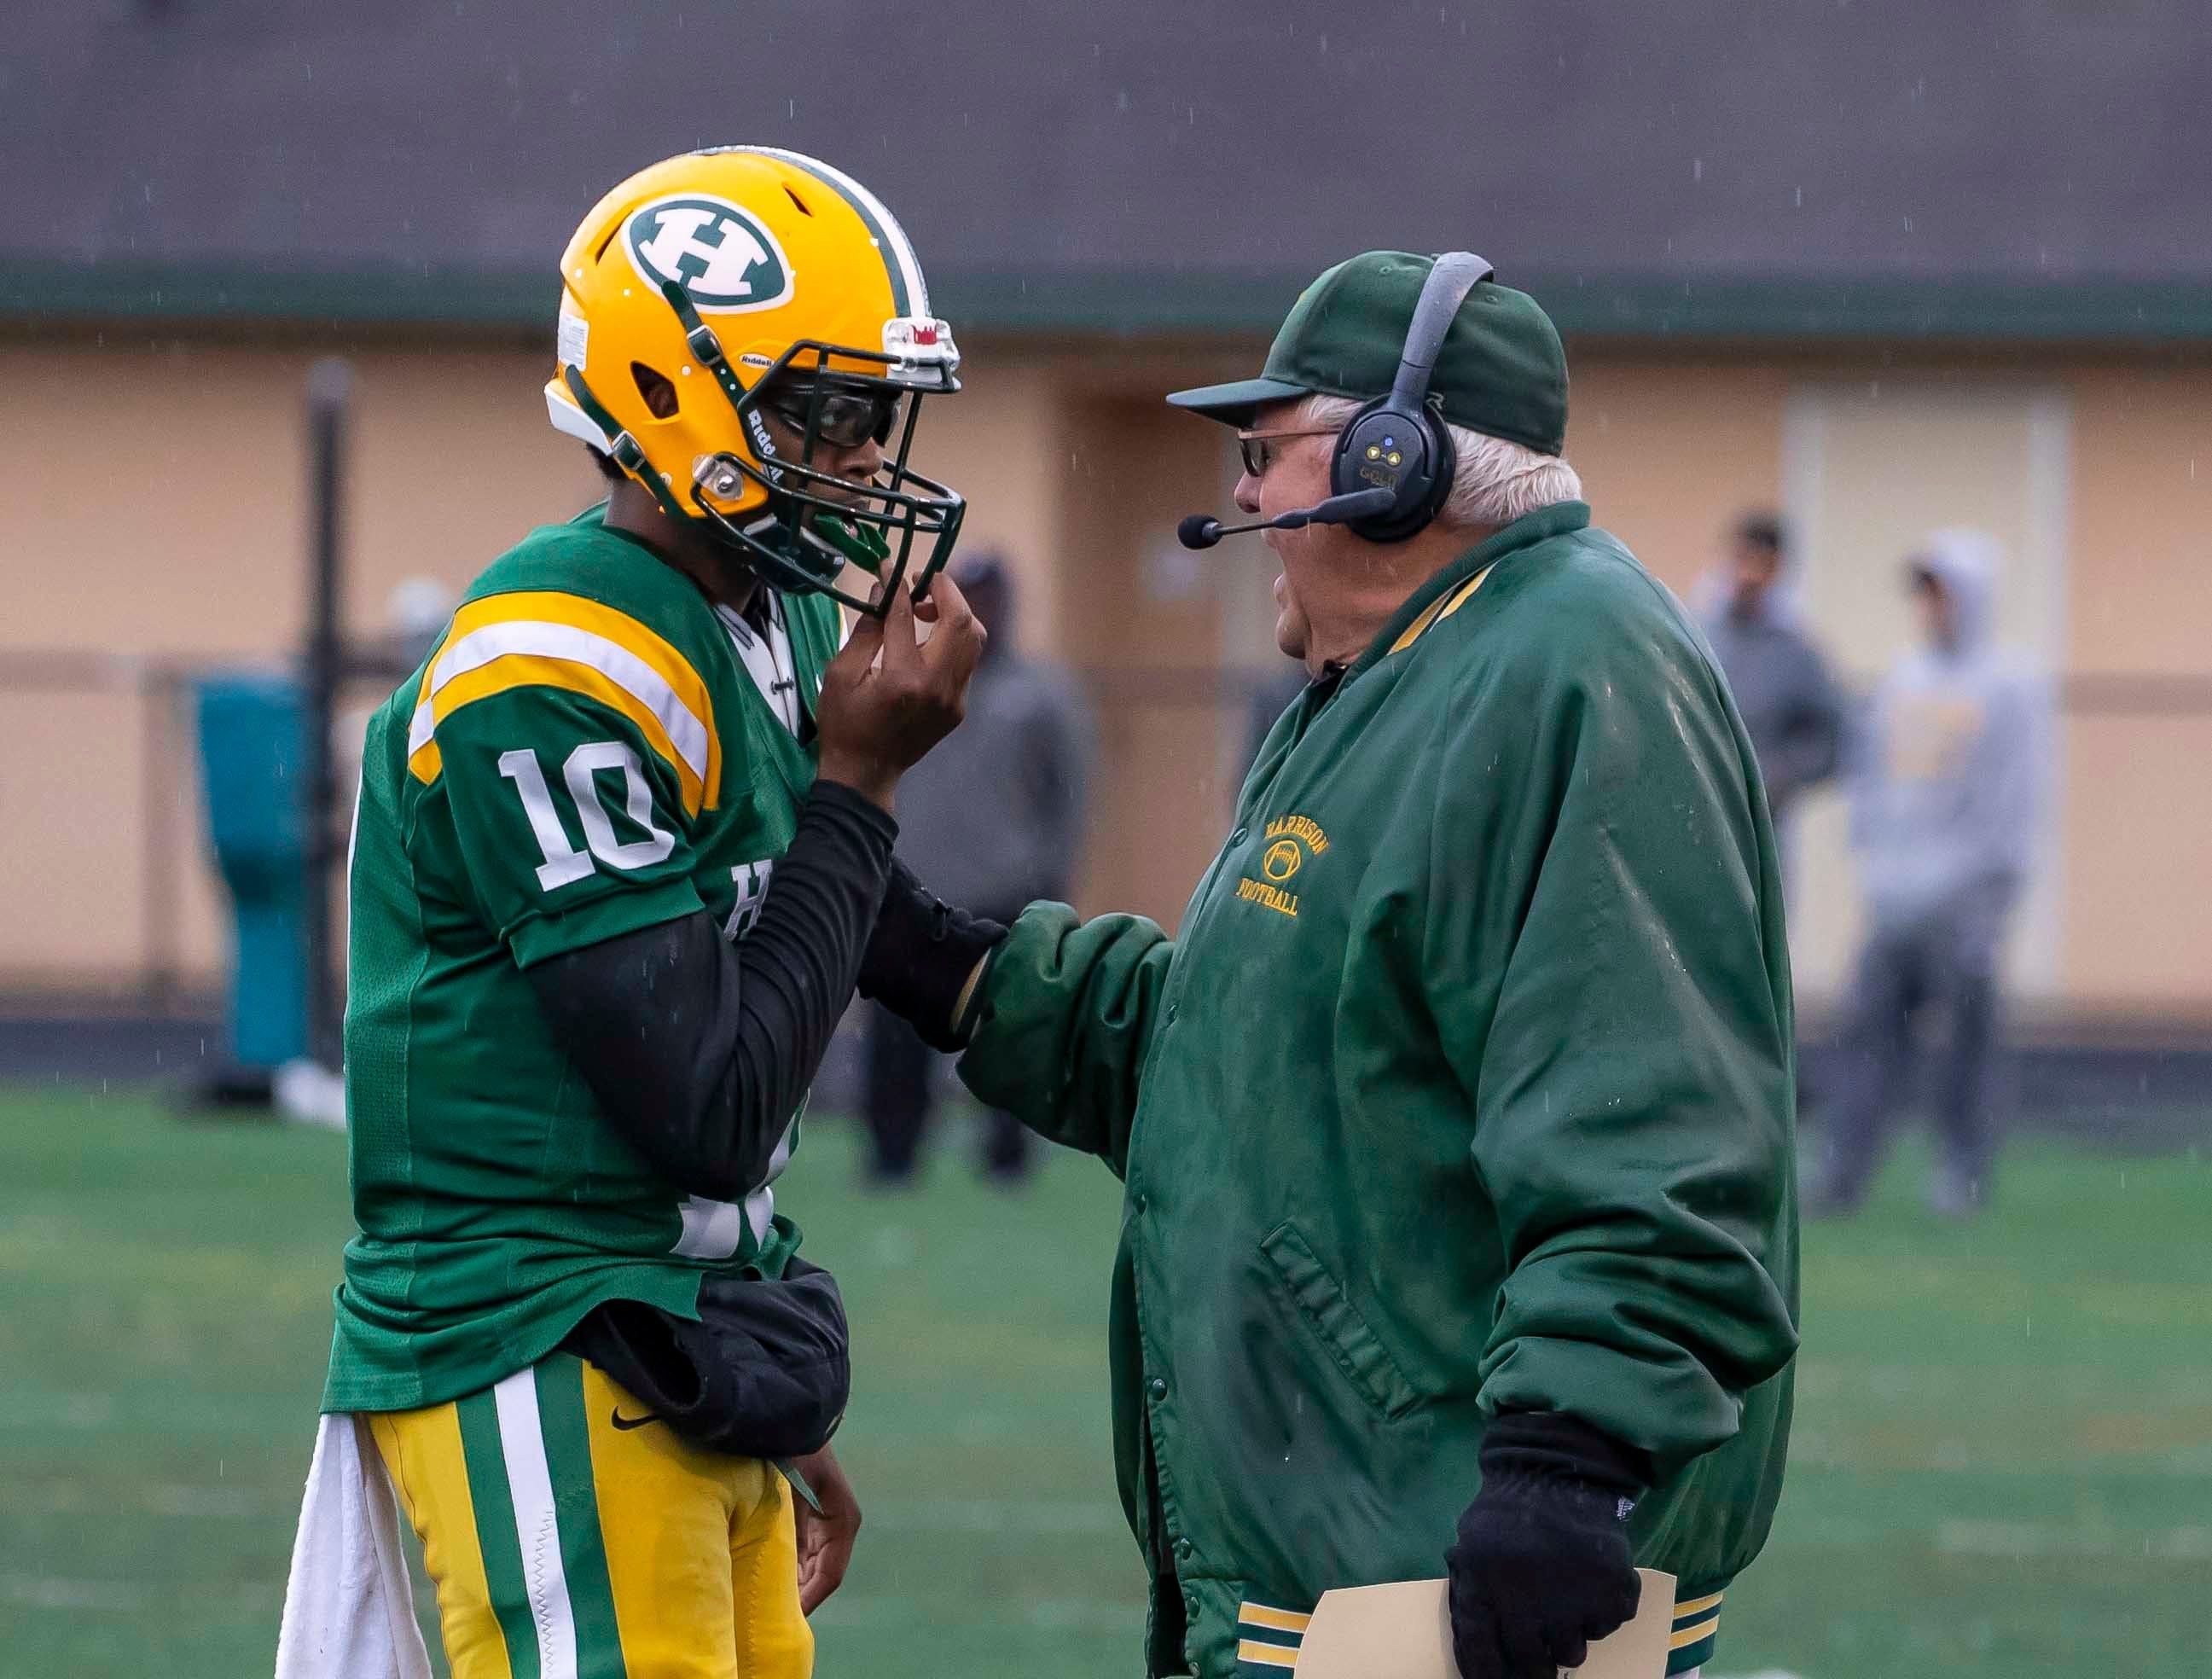 Harrison head coach John Herrington talks to his quarterback Keel Watson (10) in the second half.